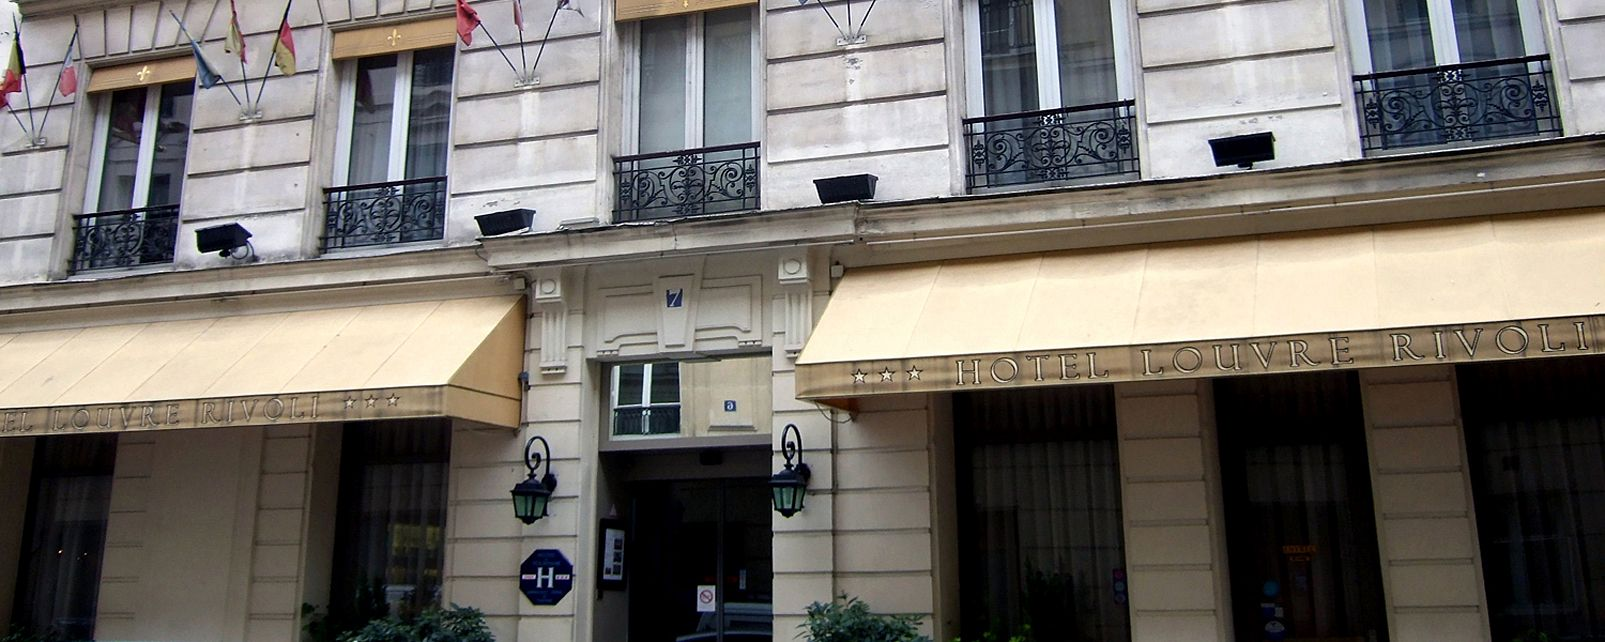 Hotel Louvre Rivoli